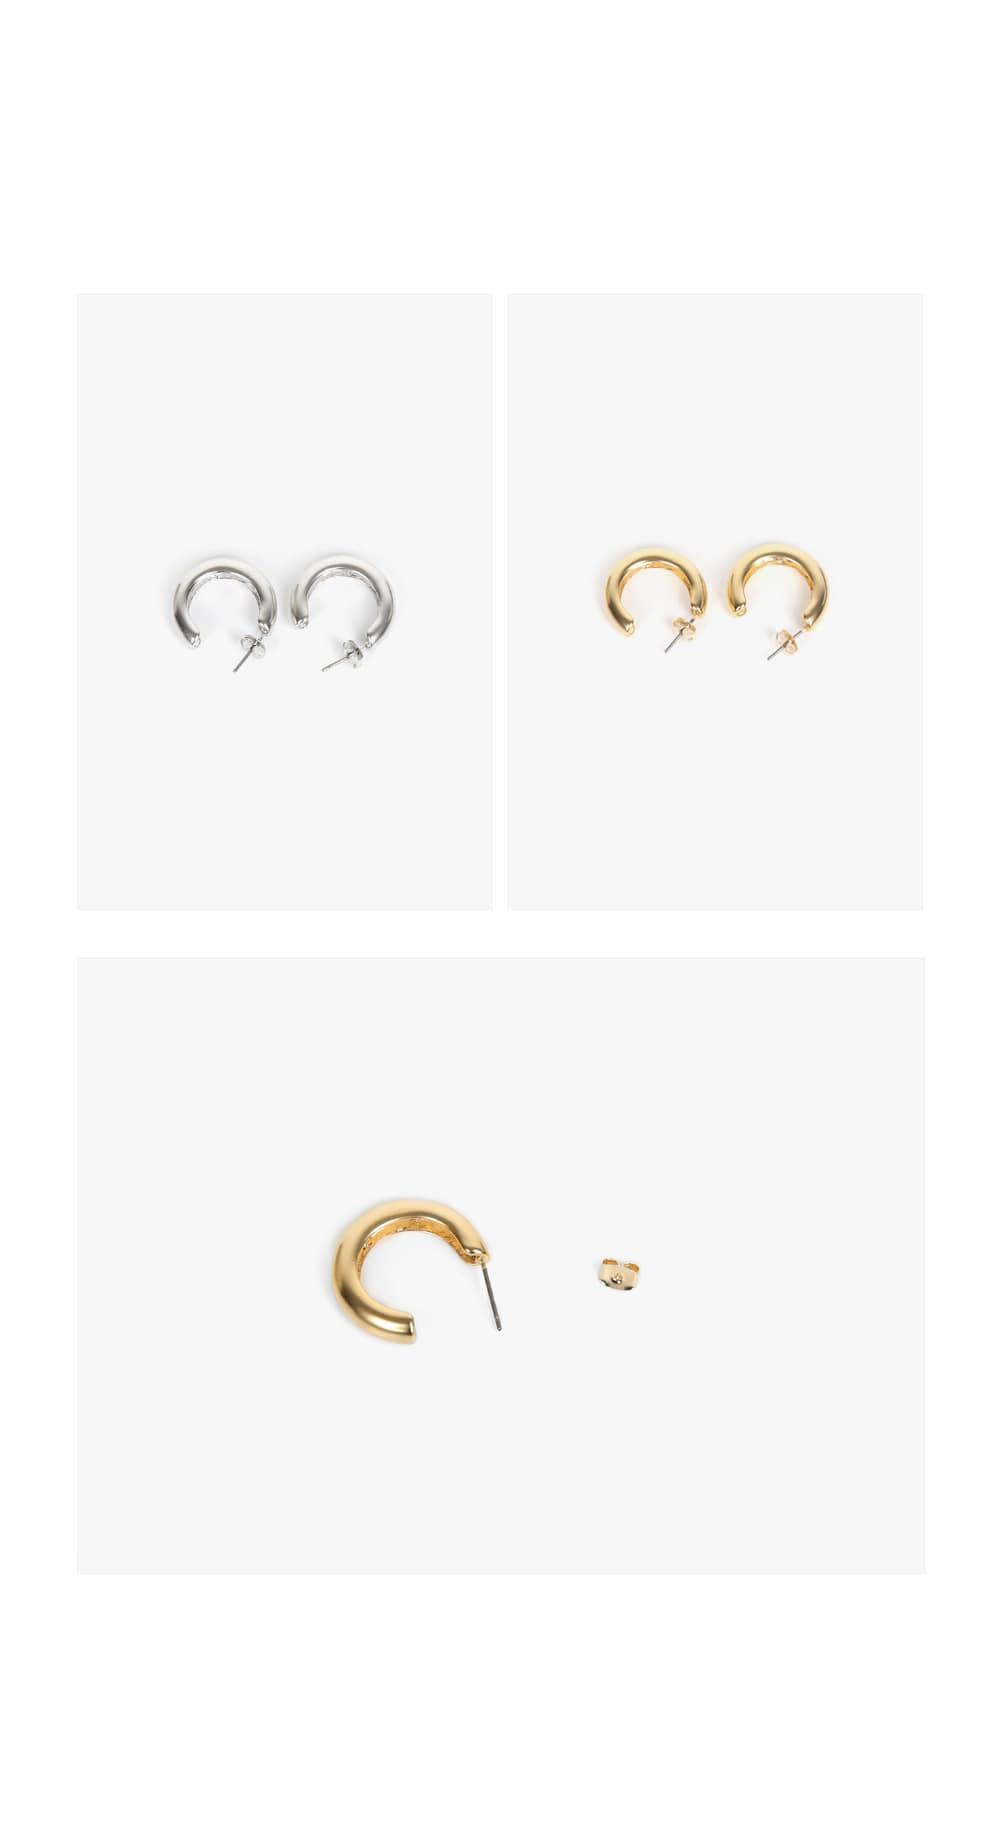 say bold earring